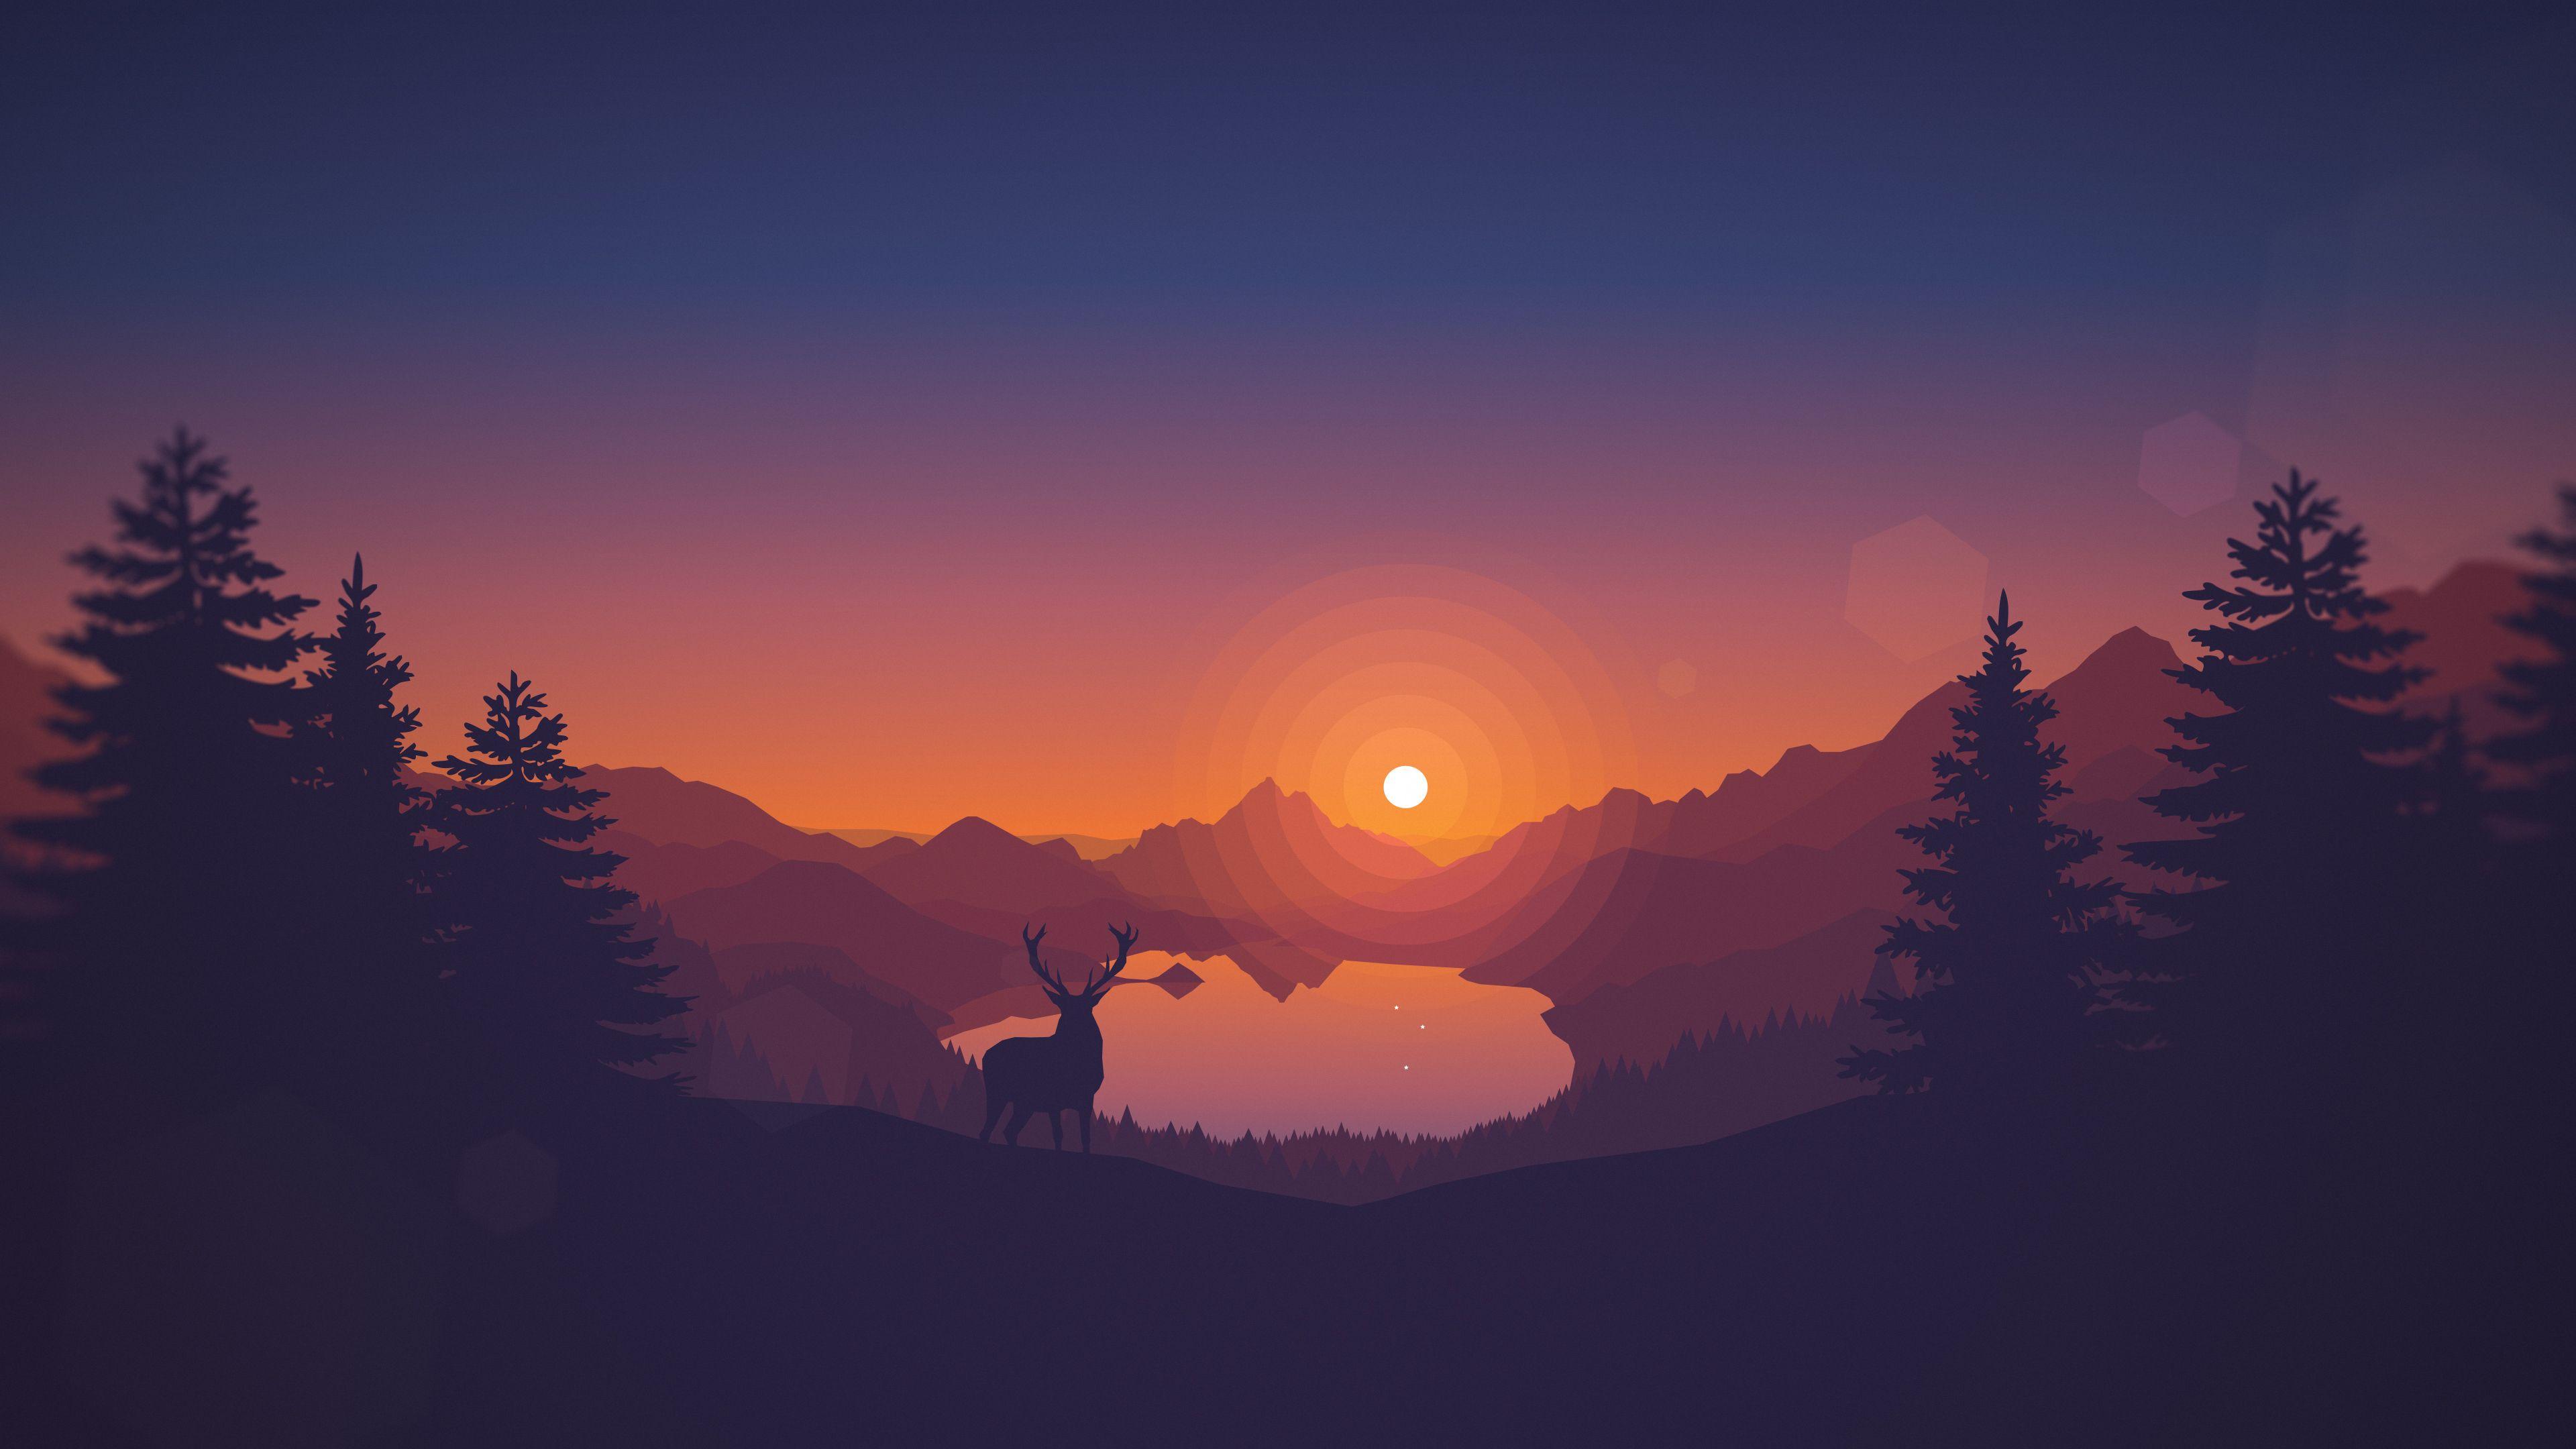 Firewatch Wallpaper Hd Download Landscape Wallpaper Sunset Wallpaper Minimalist Wallpaper